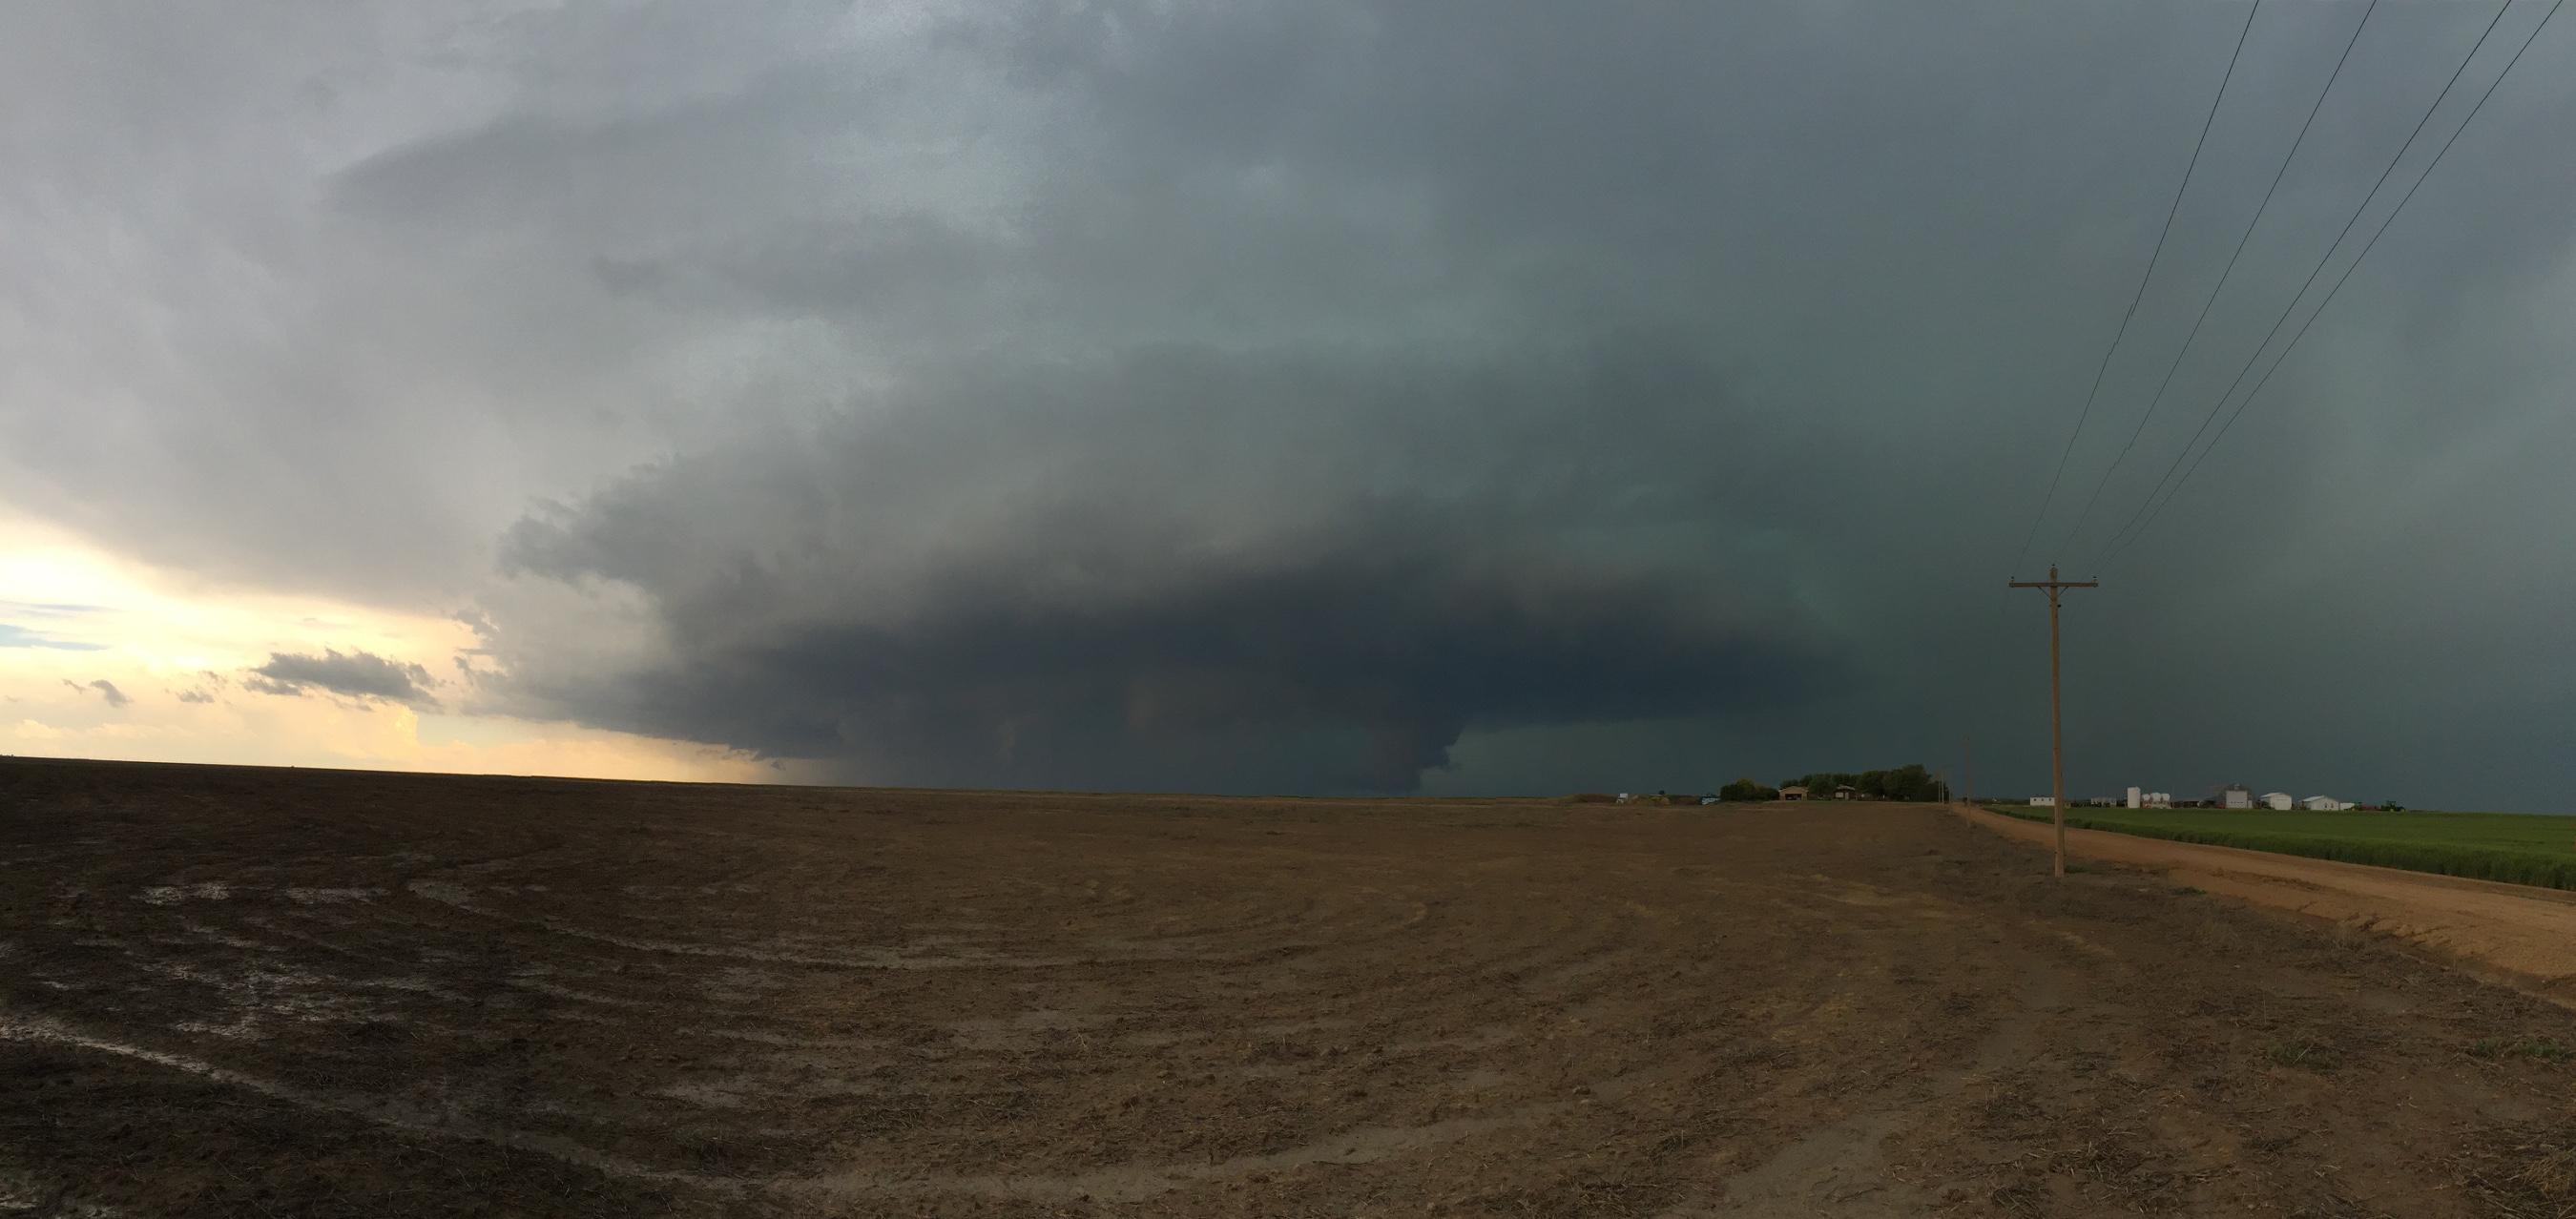 Tornado warned storm near Lamar, CO on Sunday   Sam Ng